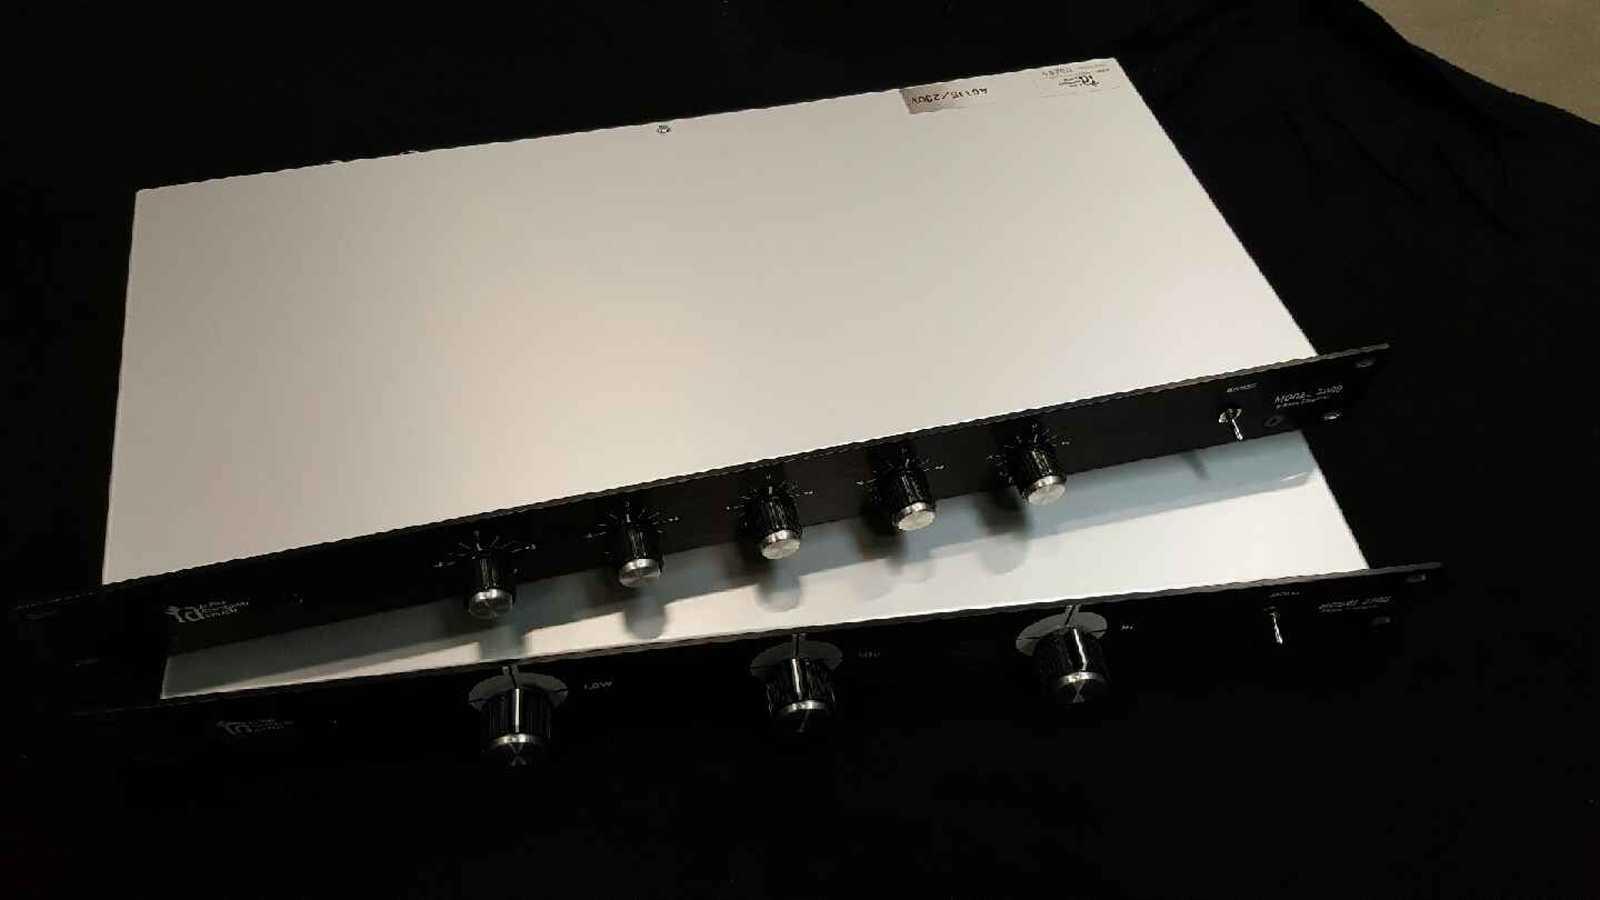 Alpha Recording System Model-5000